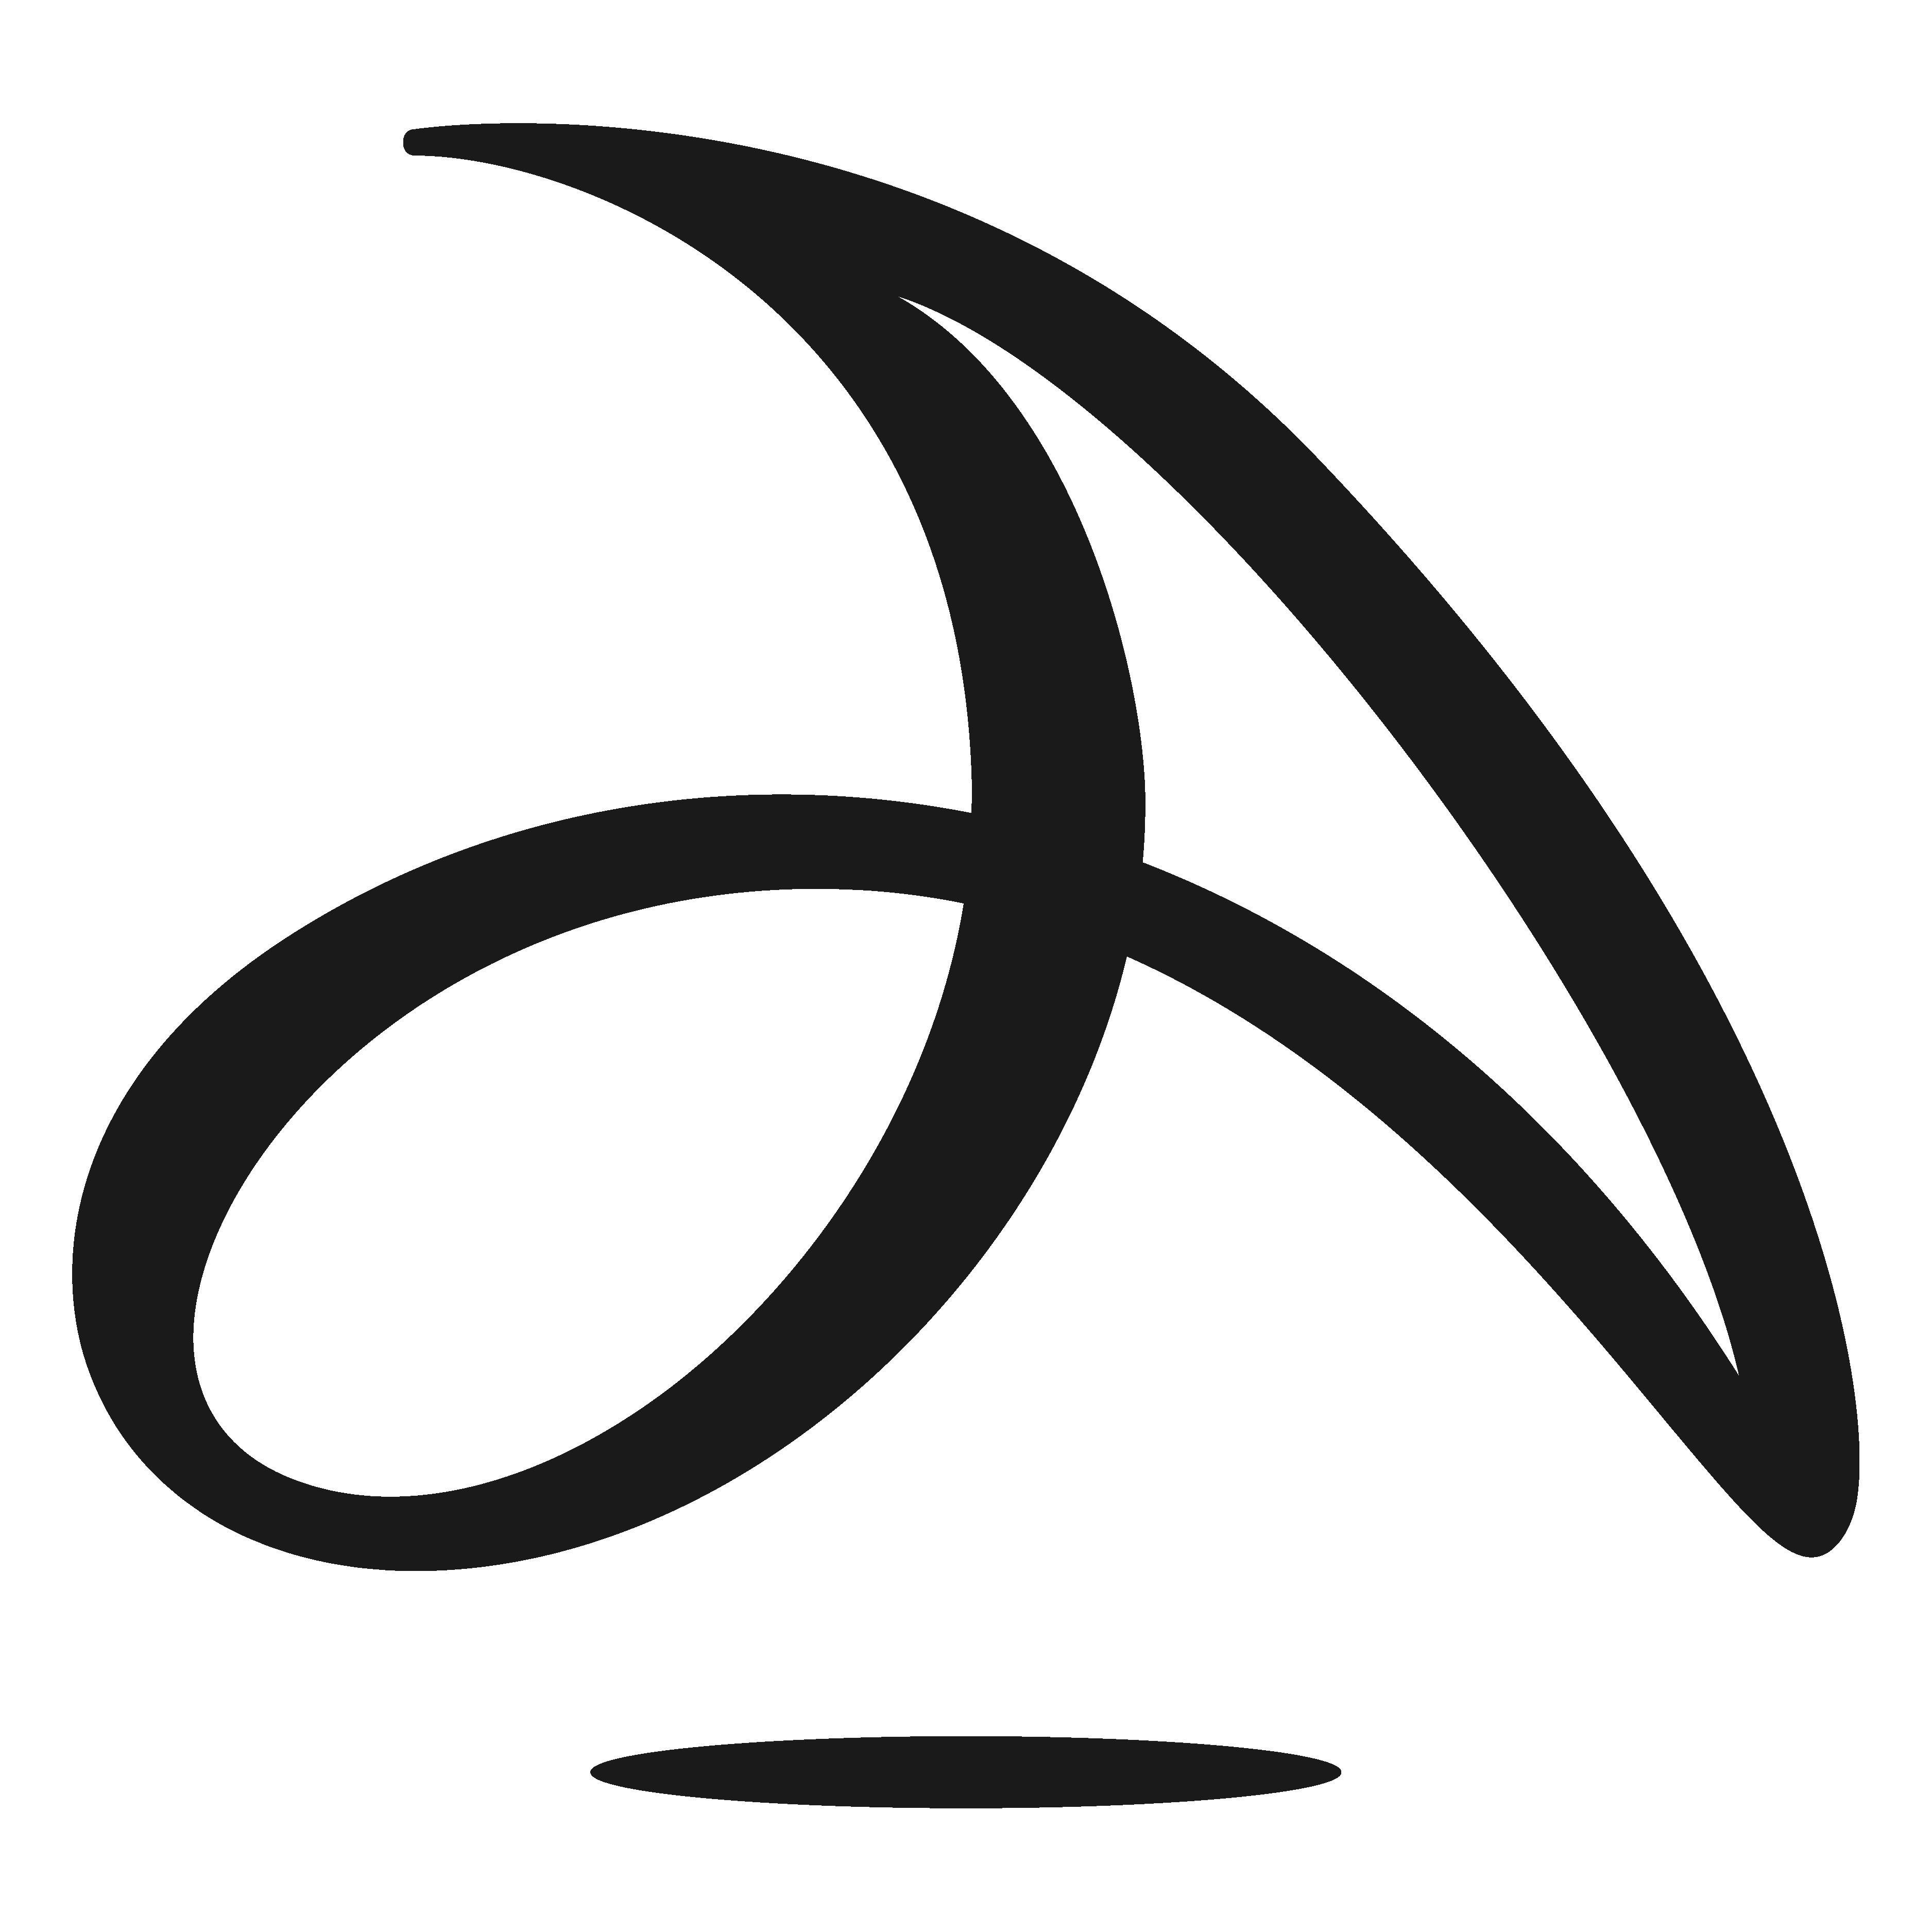 JAWInn Fit / Fitness Logo design for fitness related brand, packaging/box design.